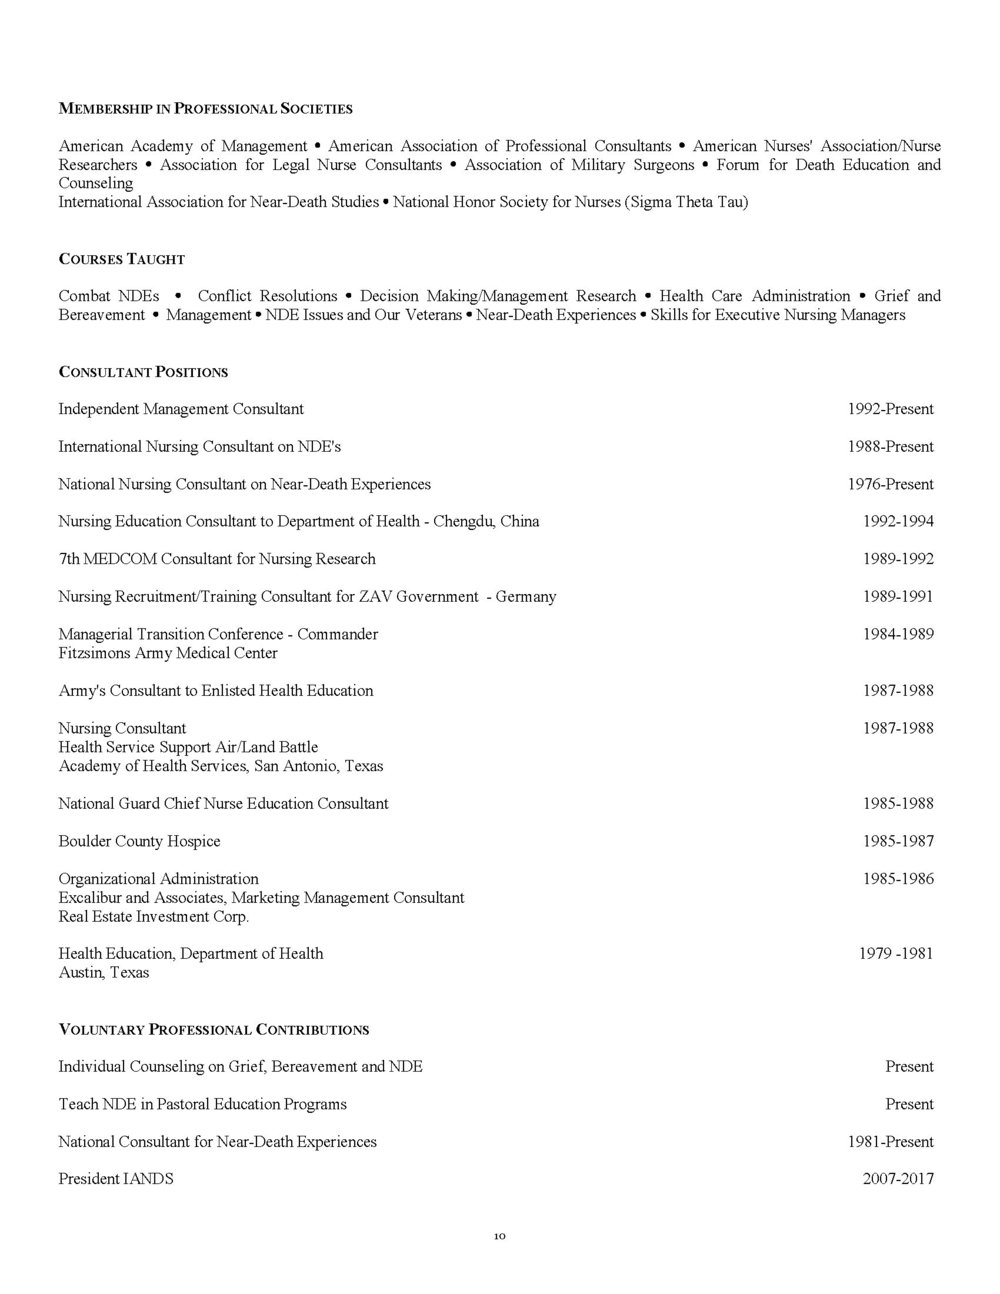 Diane Corcoran Resume V2a_Page_10.jpg